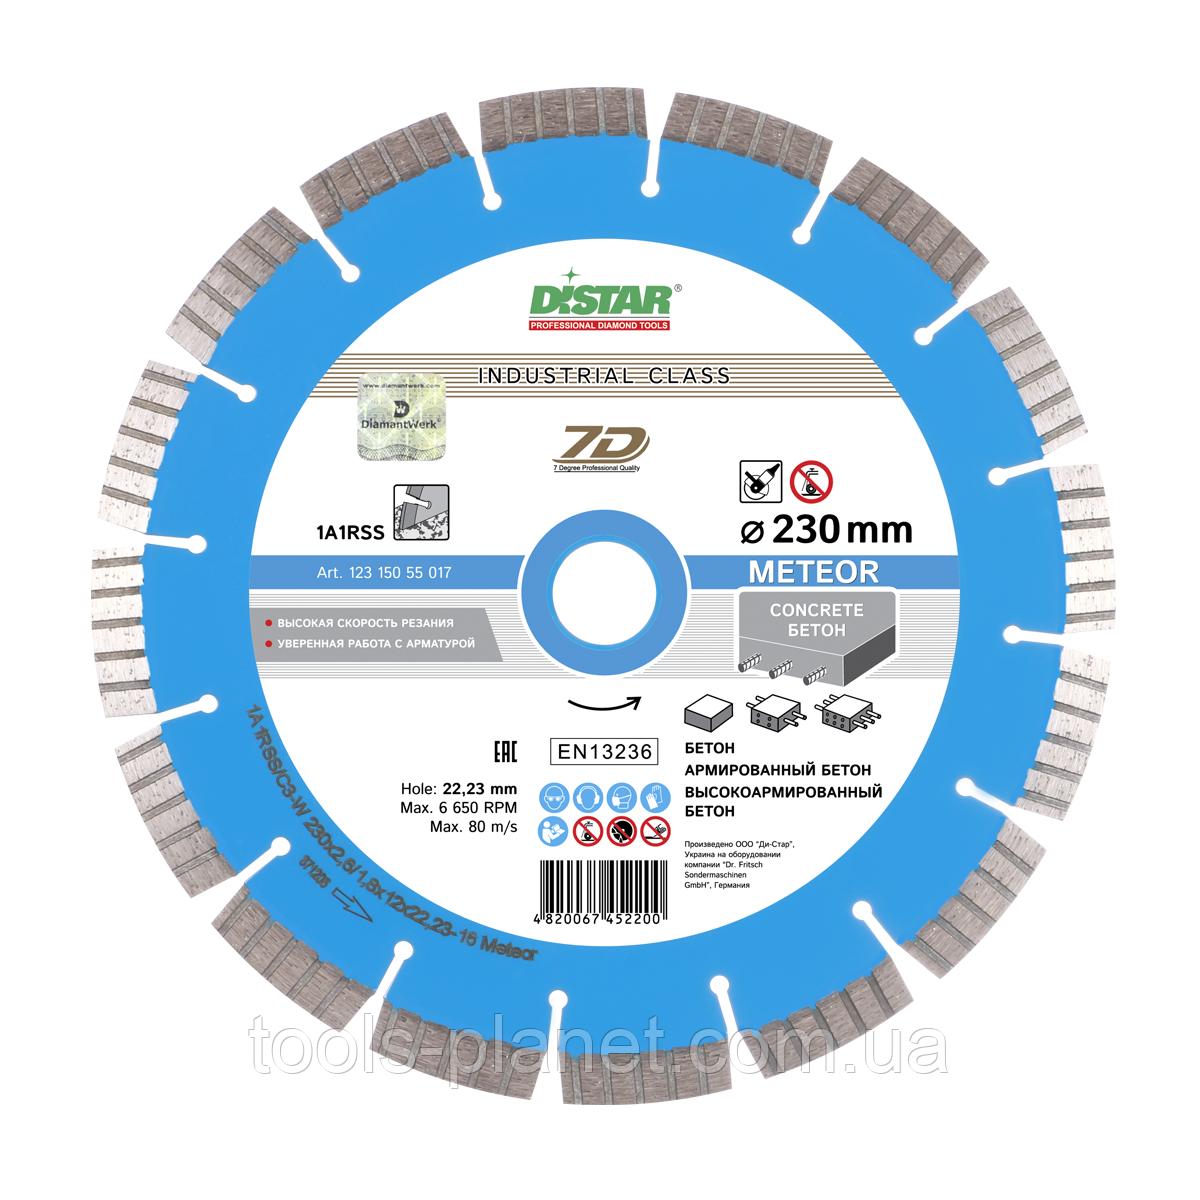 Алмазный диск Distar 1A1RSS/C3 230 x 2,6 x 12 x 22,23 Meteor 7D (12315055017)